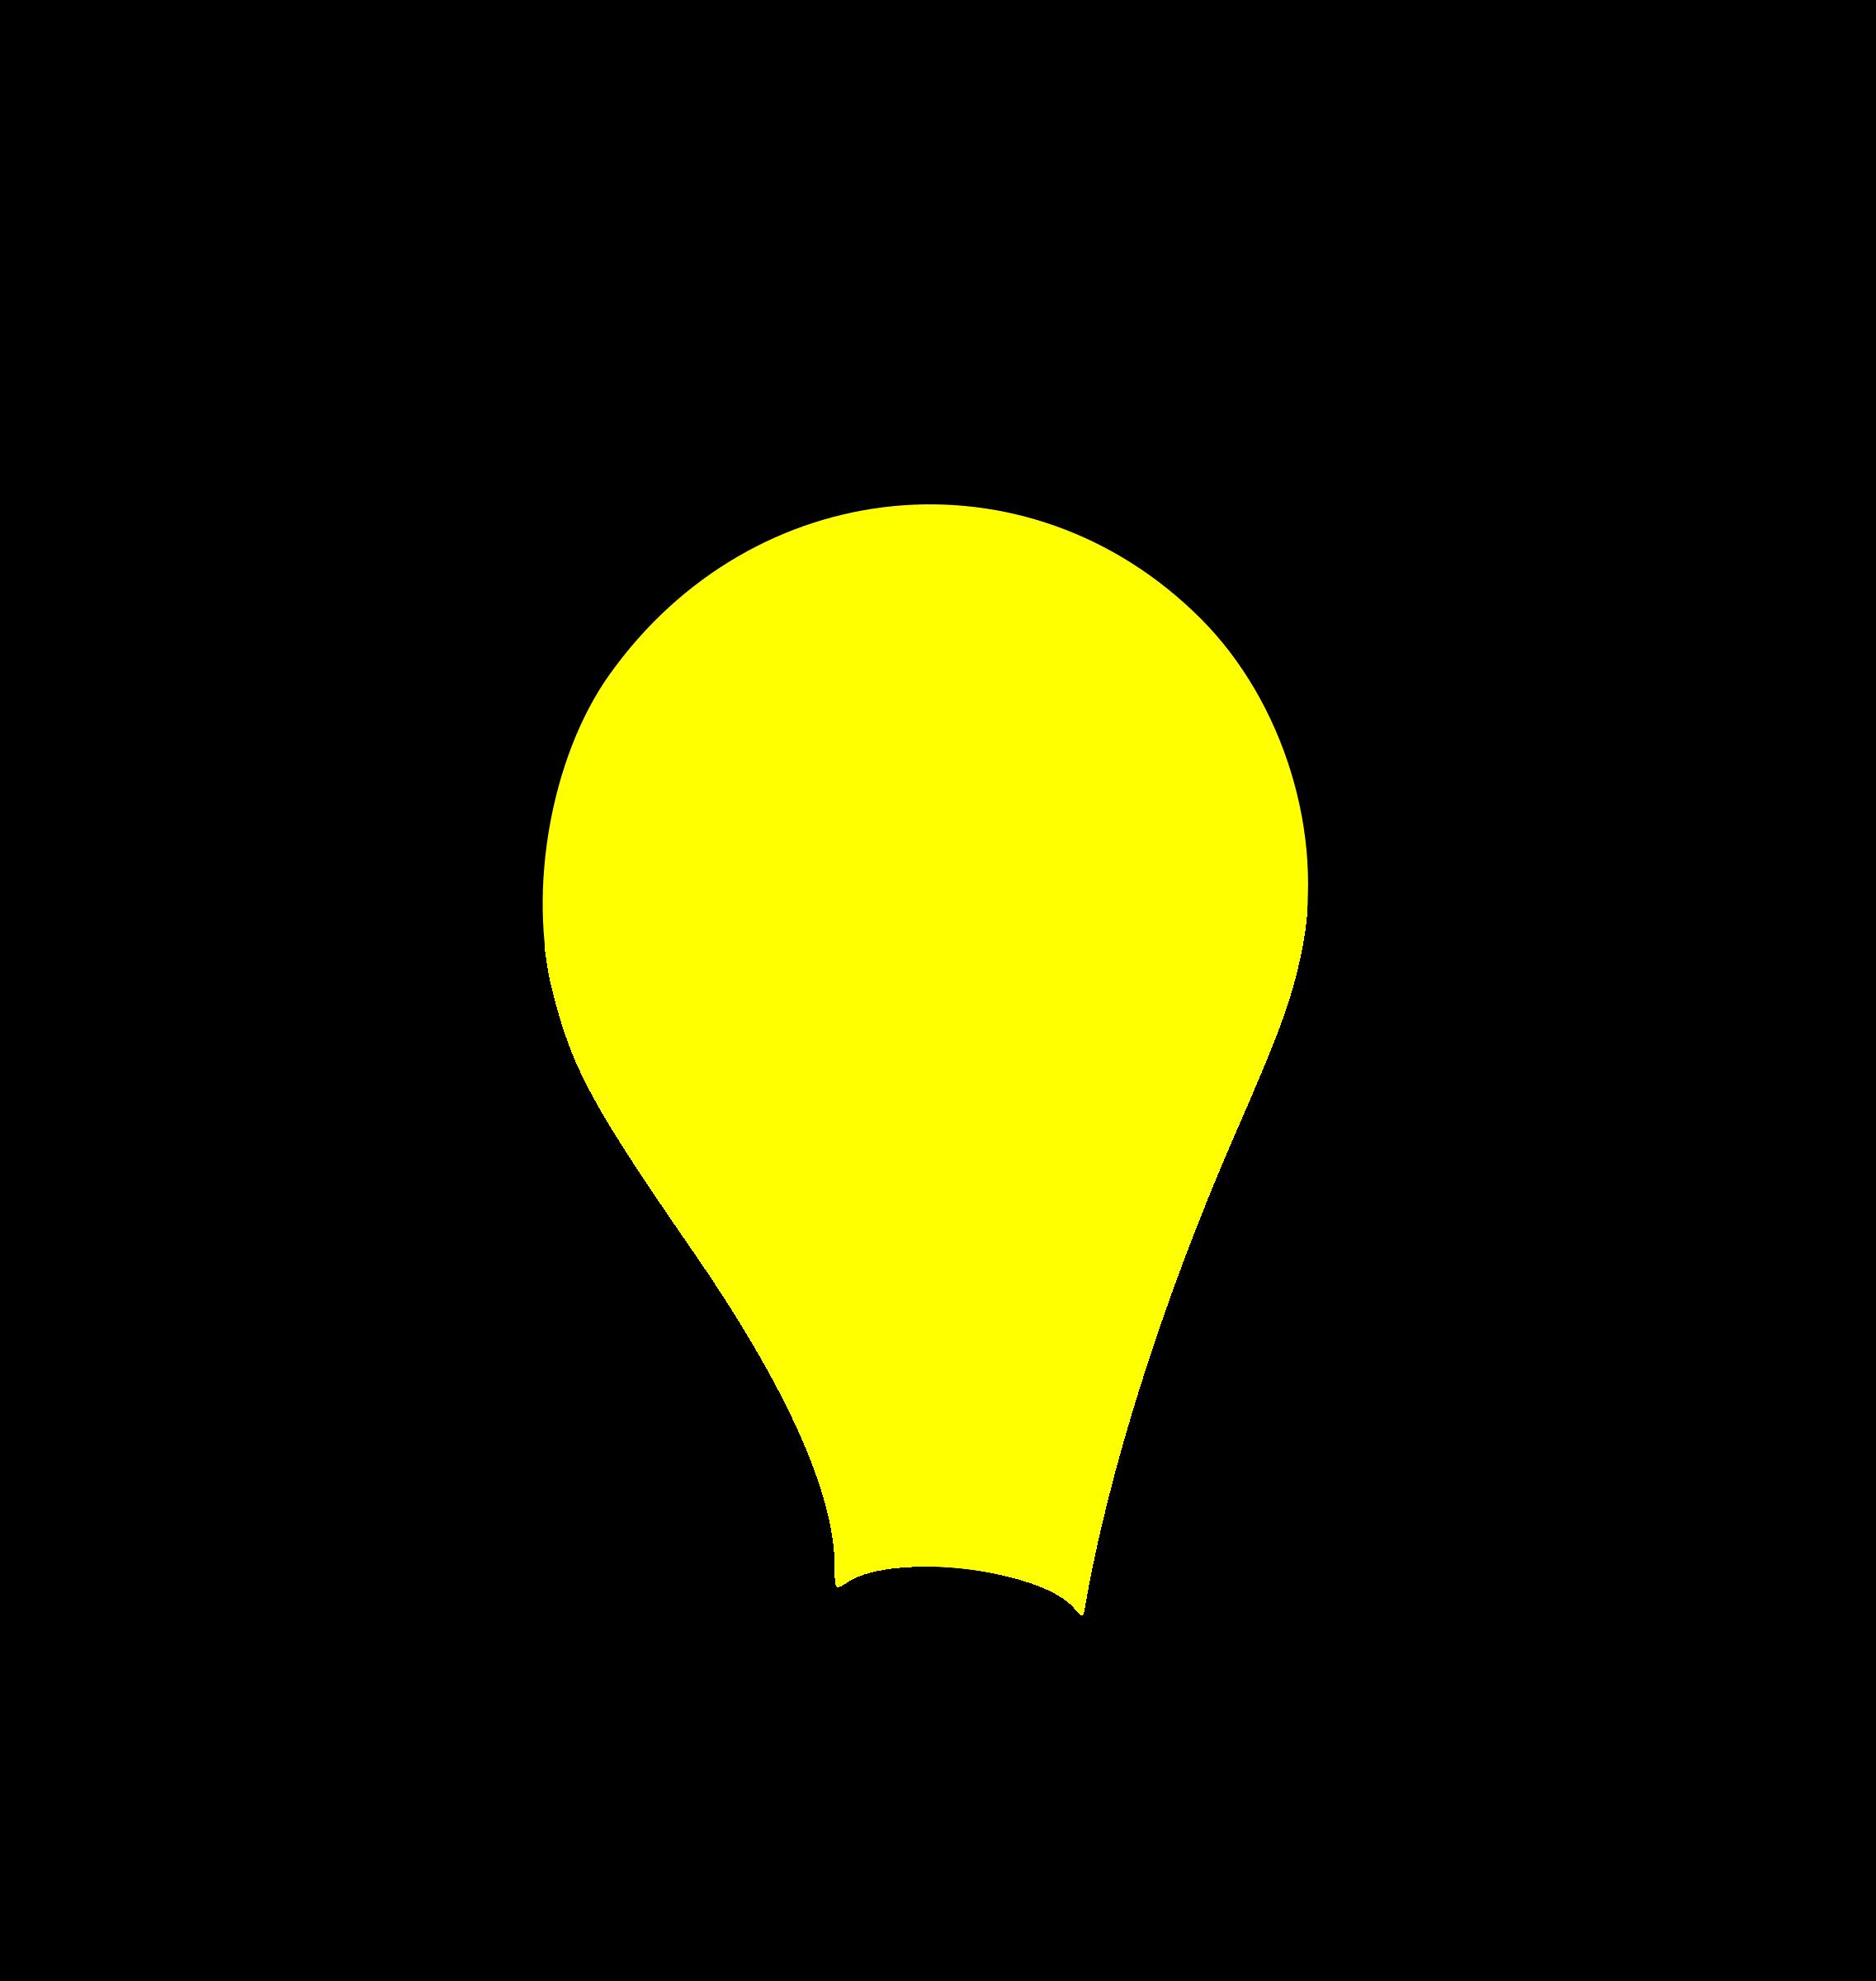 svg library Light on clipground lightbulb. Lights clipart bold.